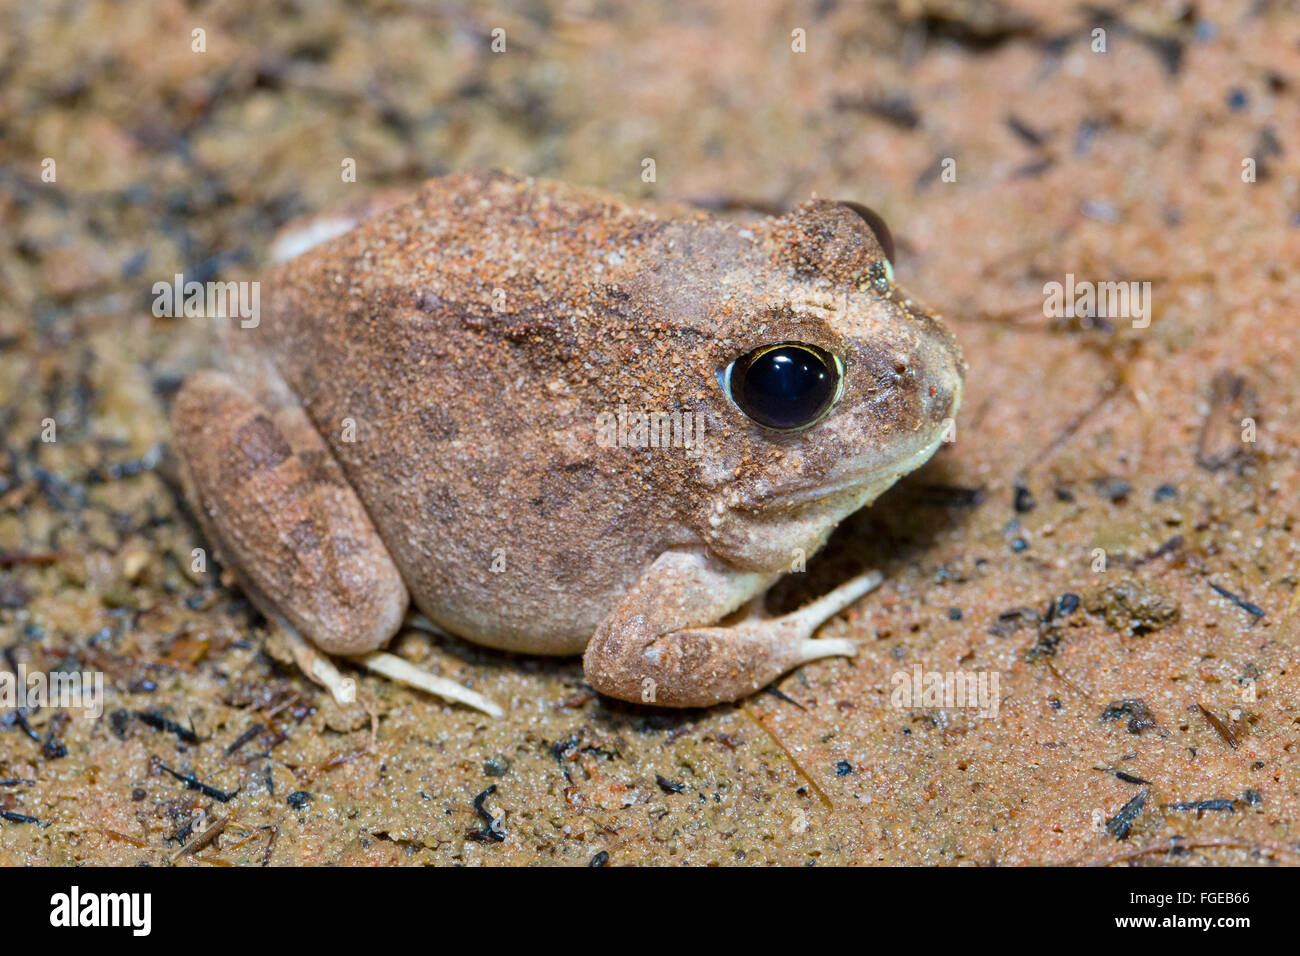 Ornate Burrowing Frog (Platyplectrum ornatum), Queensland, Australia - Stock Image